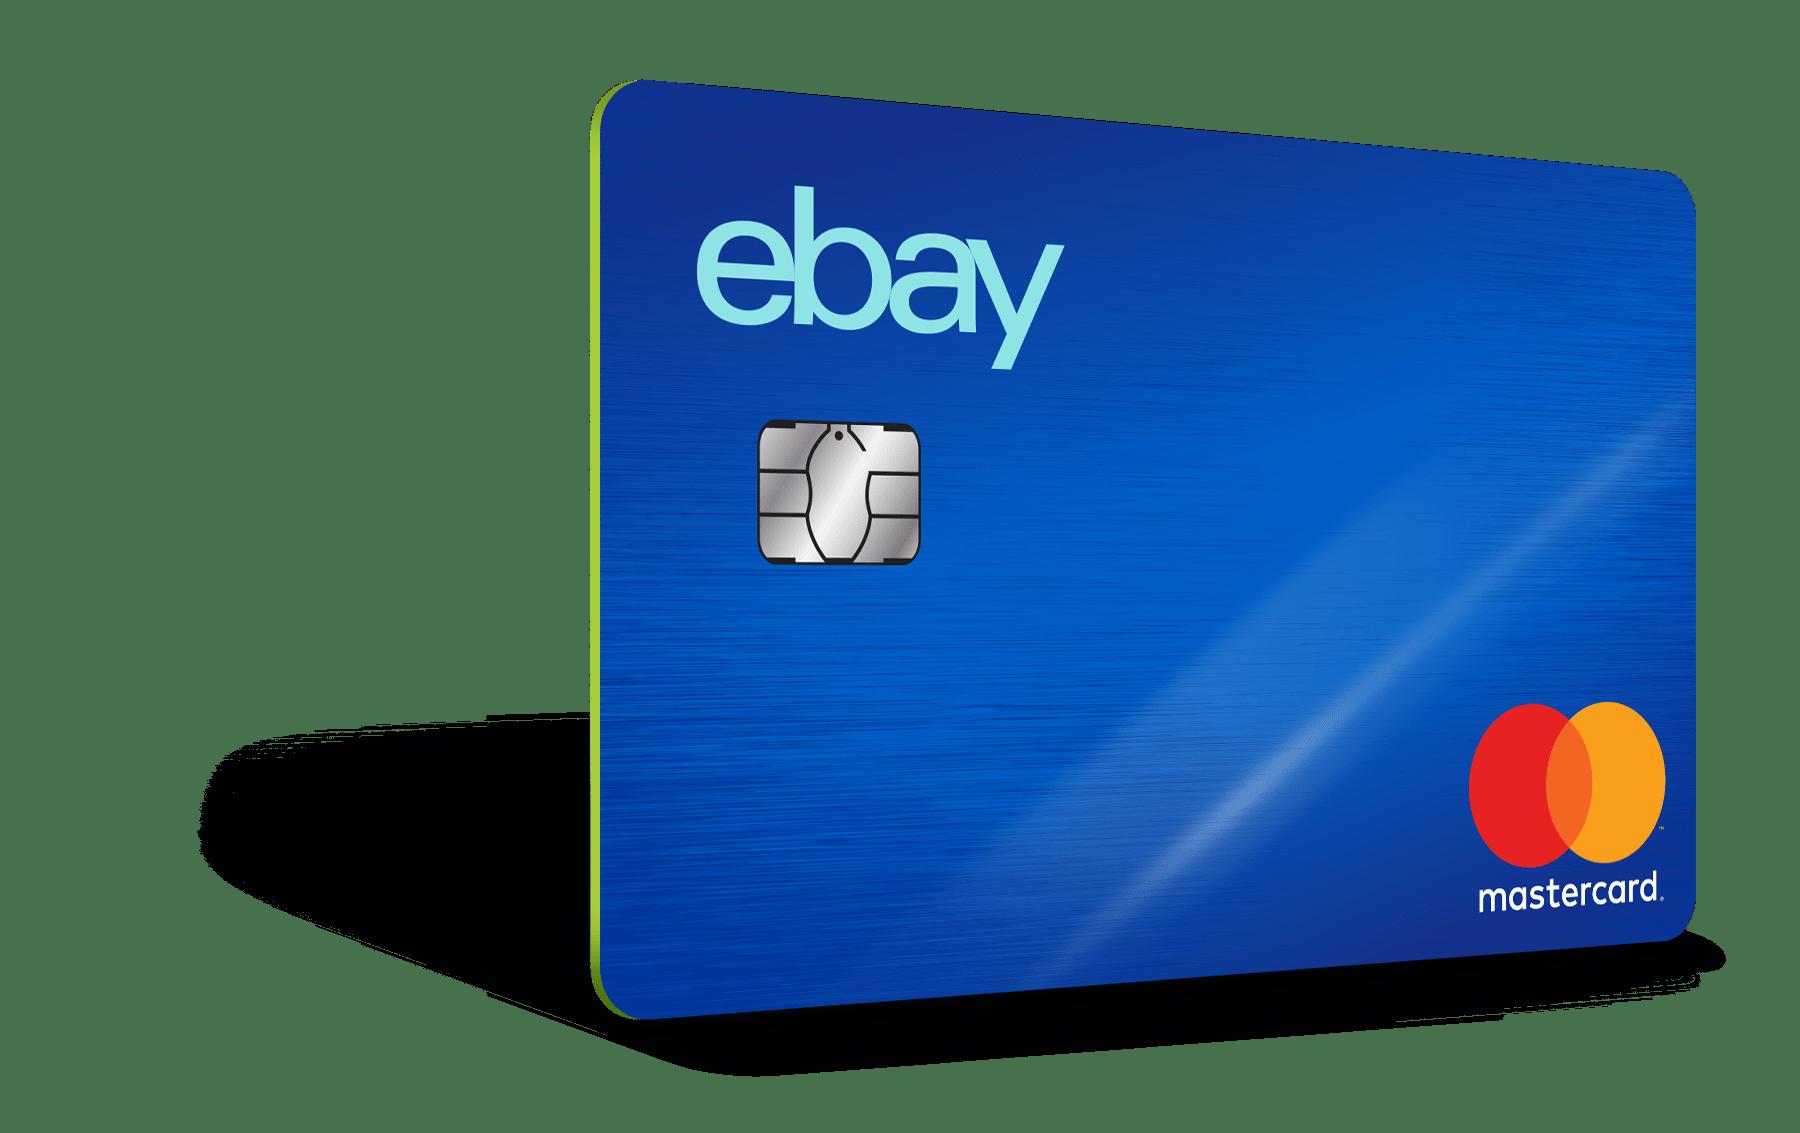 eBay Mastercard Review, $6 Bonus and 6.65X on eBay Purchases